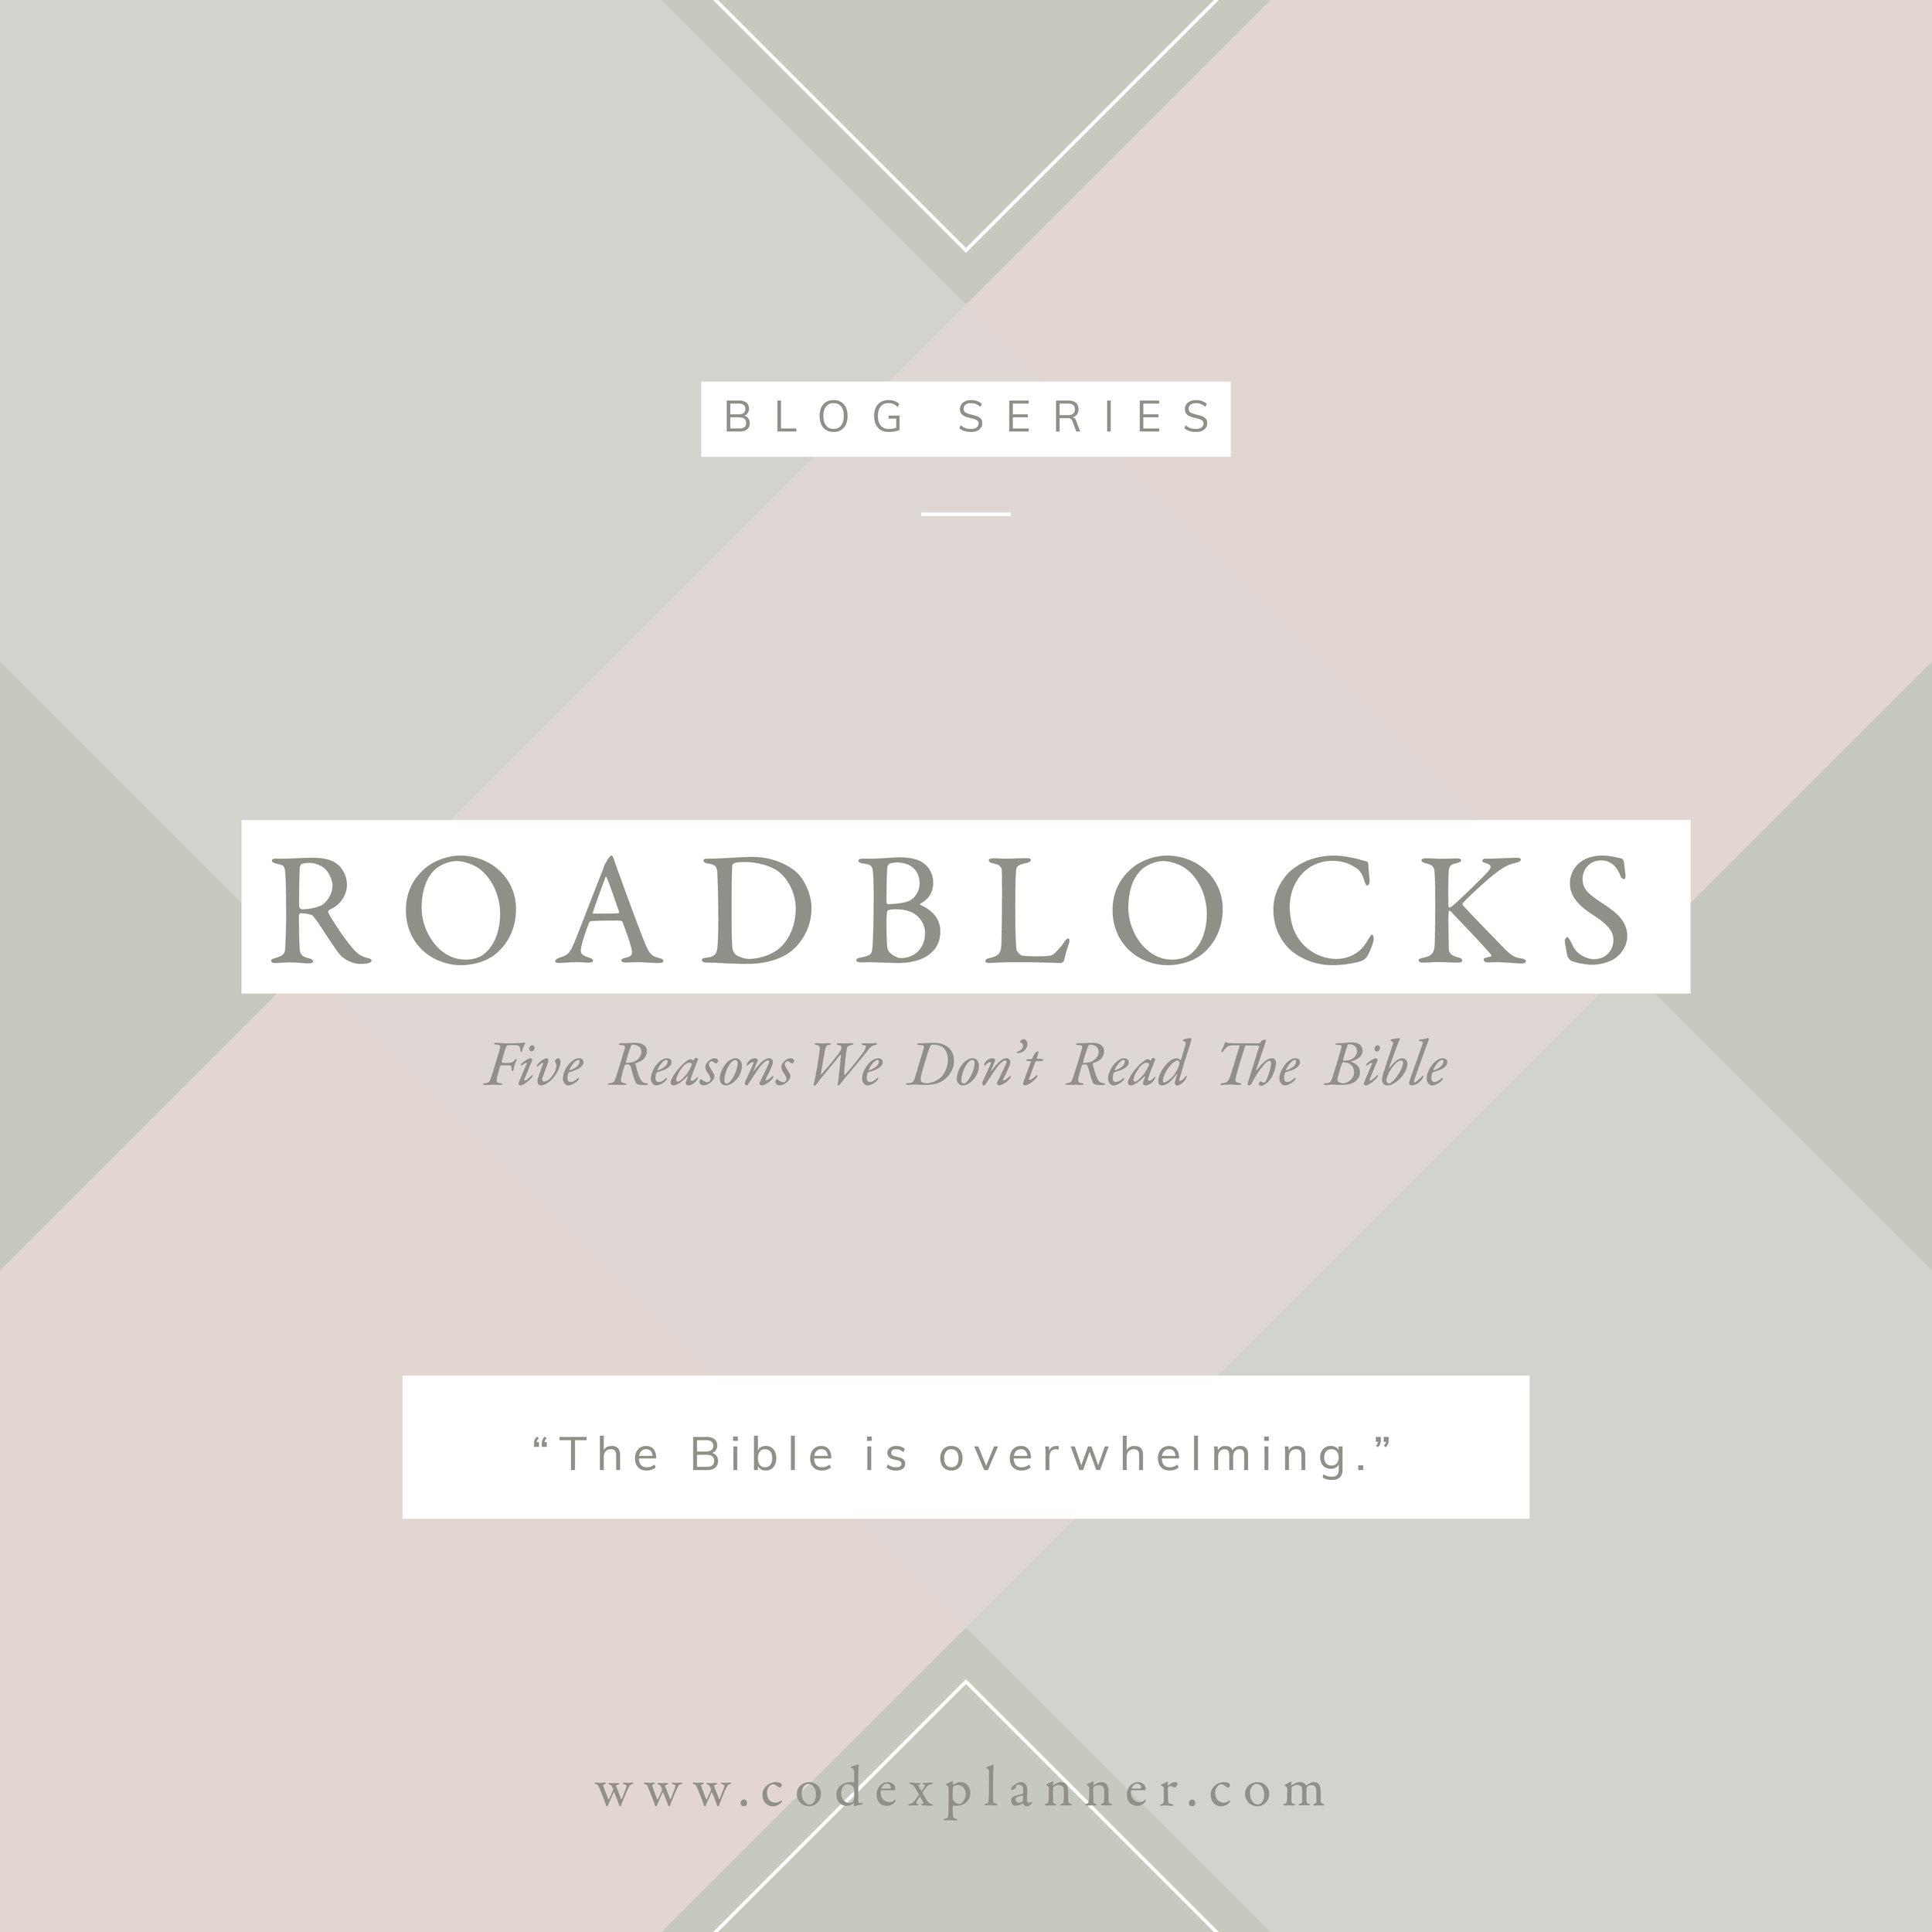 roadblock_Square 5_overwhelming_Square 5_Square 5.jpg